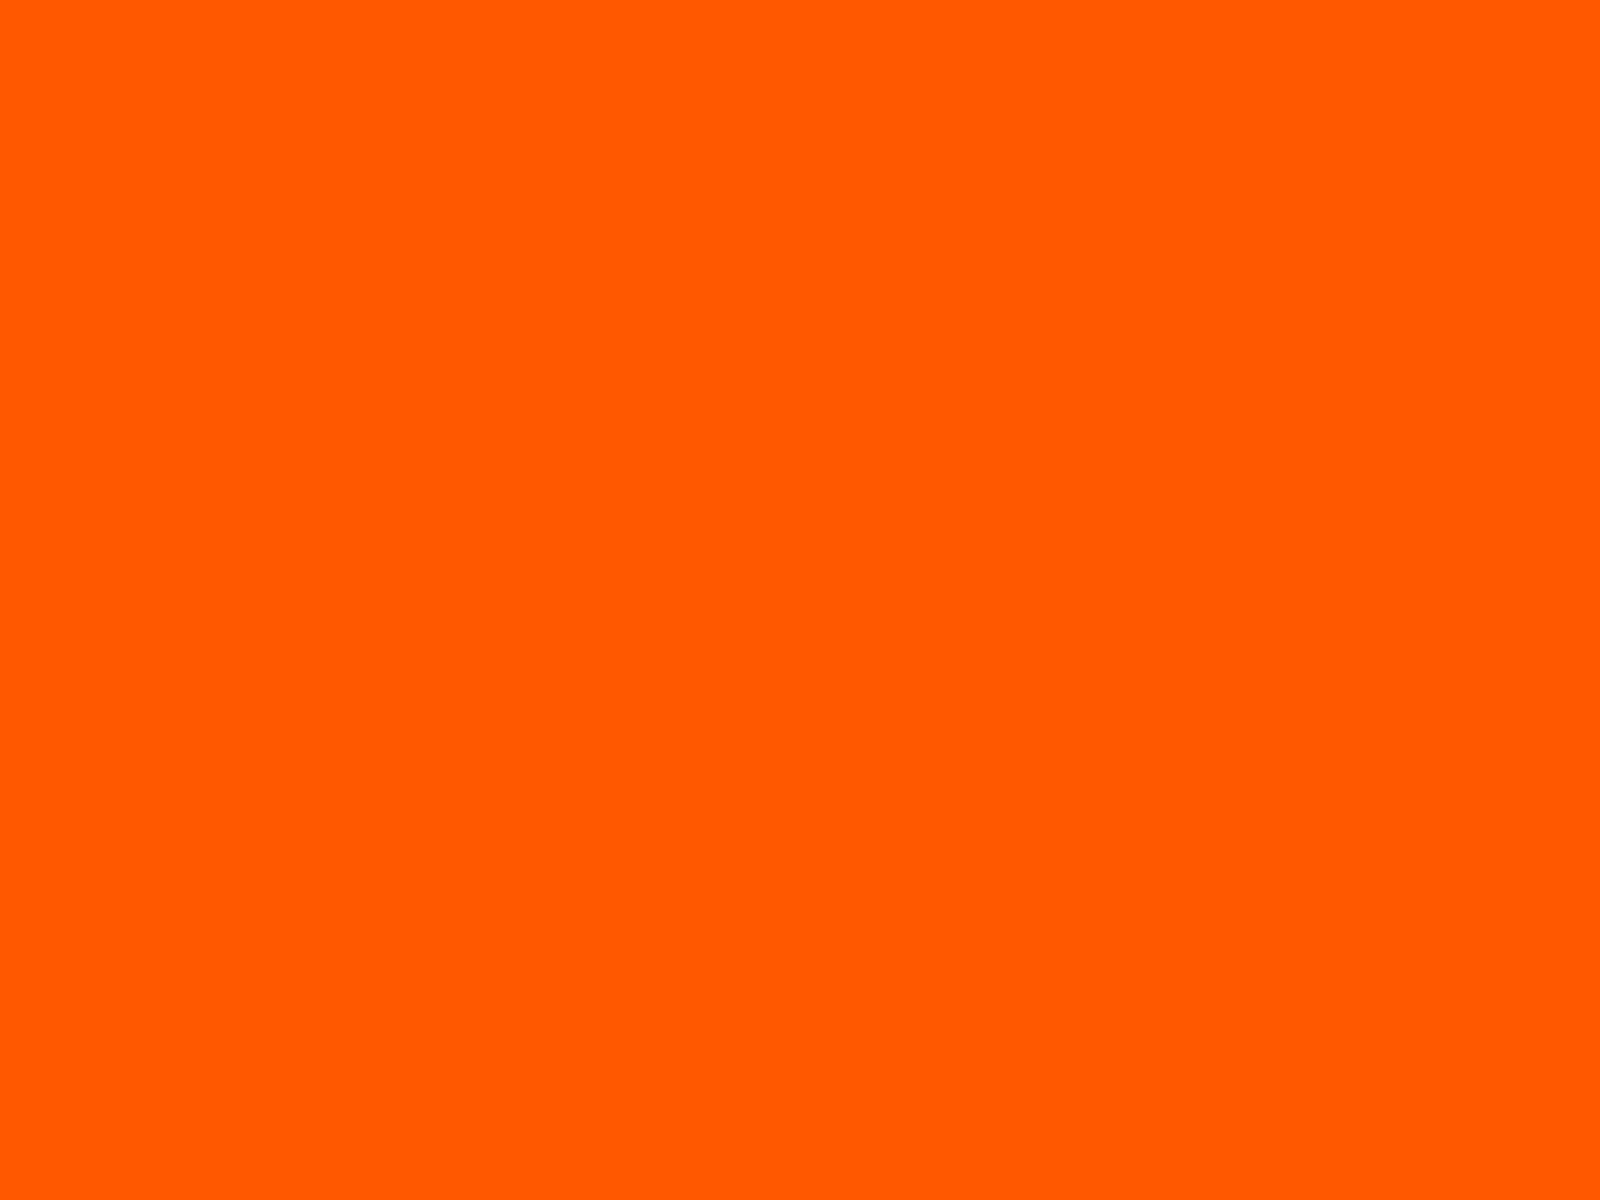 1600x1200 Orange Pantone Solid Color Background